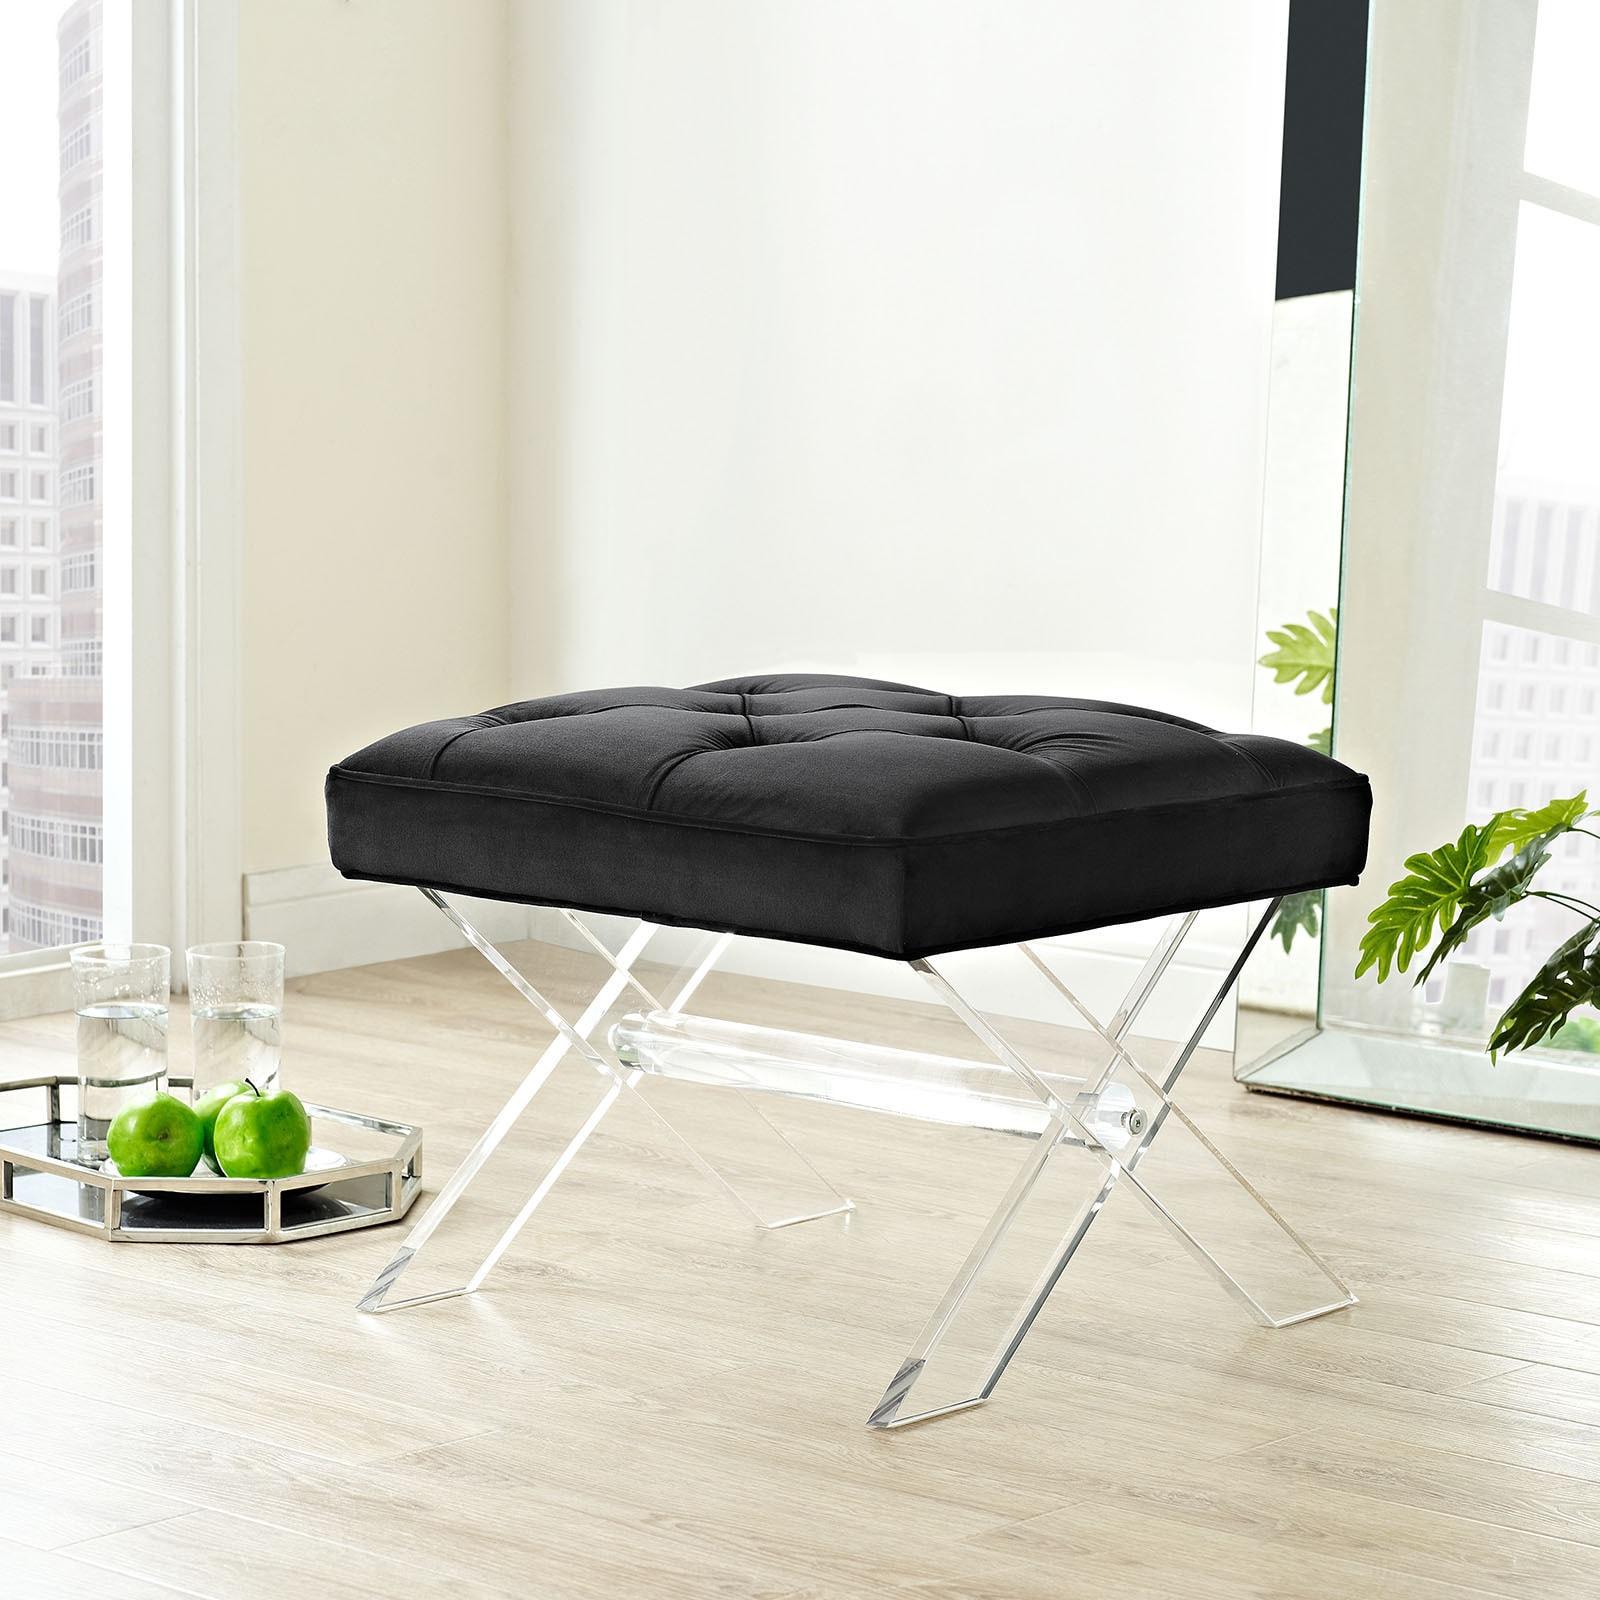 Outstanding Modway Swift Bench Creativecarmelina Interior Chair Design Creativecarmelinacom